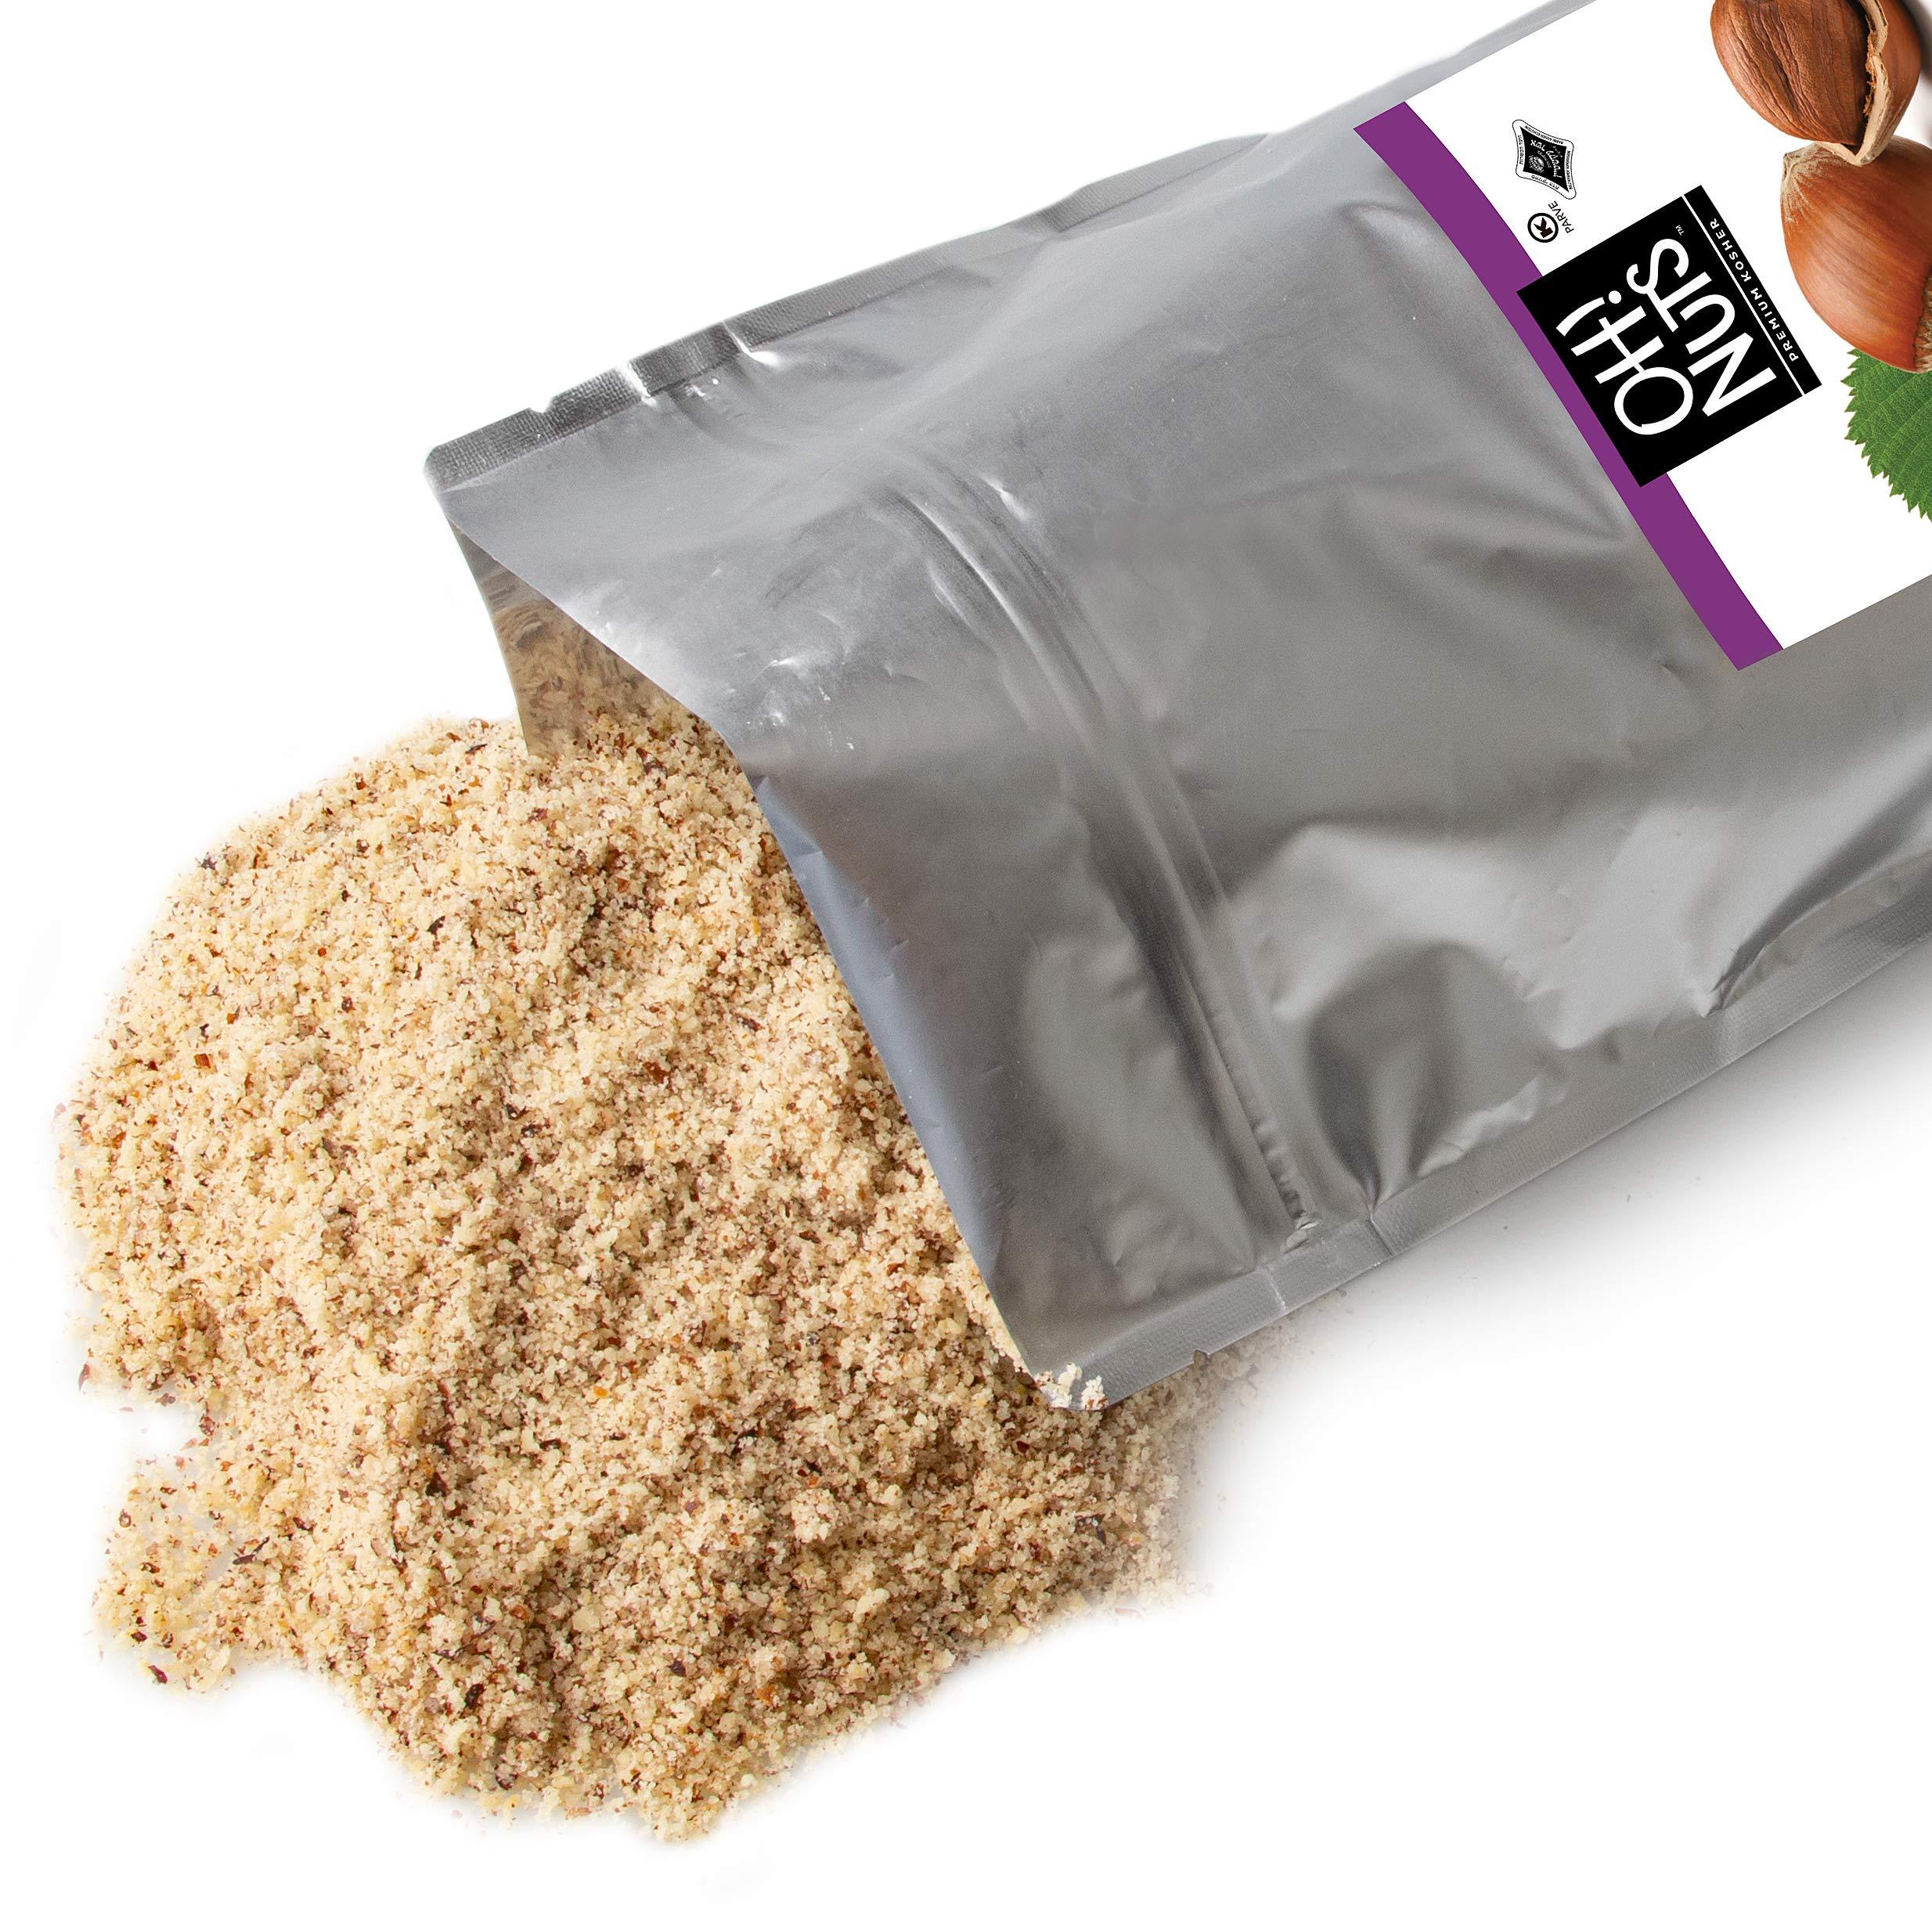 Oh! Nuts Ground Hazelnut Flour | 2lb Bulk Bag Keto-Friendly Nut Flour from Ground Filberts, Kosher Gluten Free Baking Hazelnuts Meal, Vegan Milled Filberts | Healthy Alternative Certified Kosher